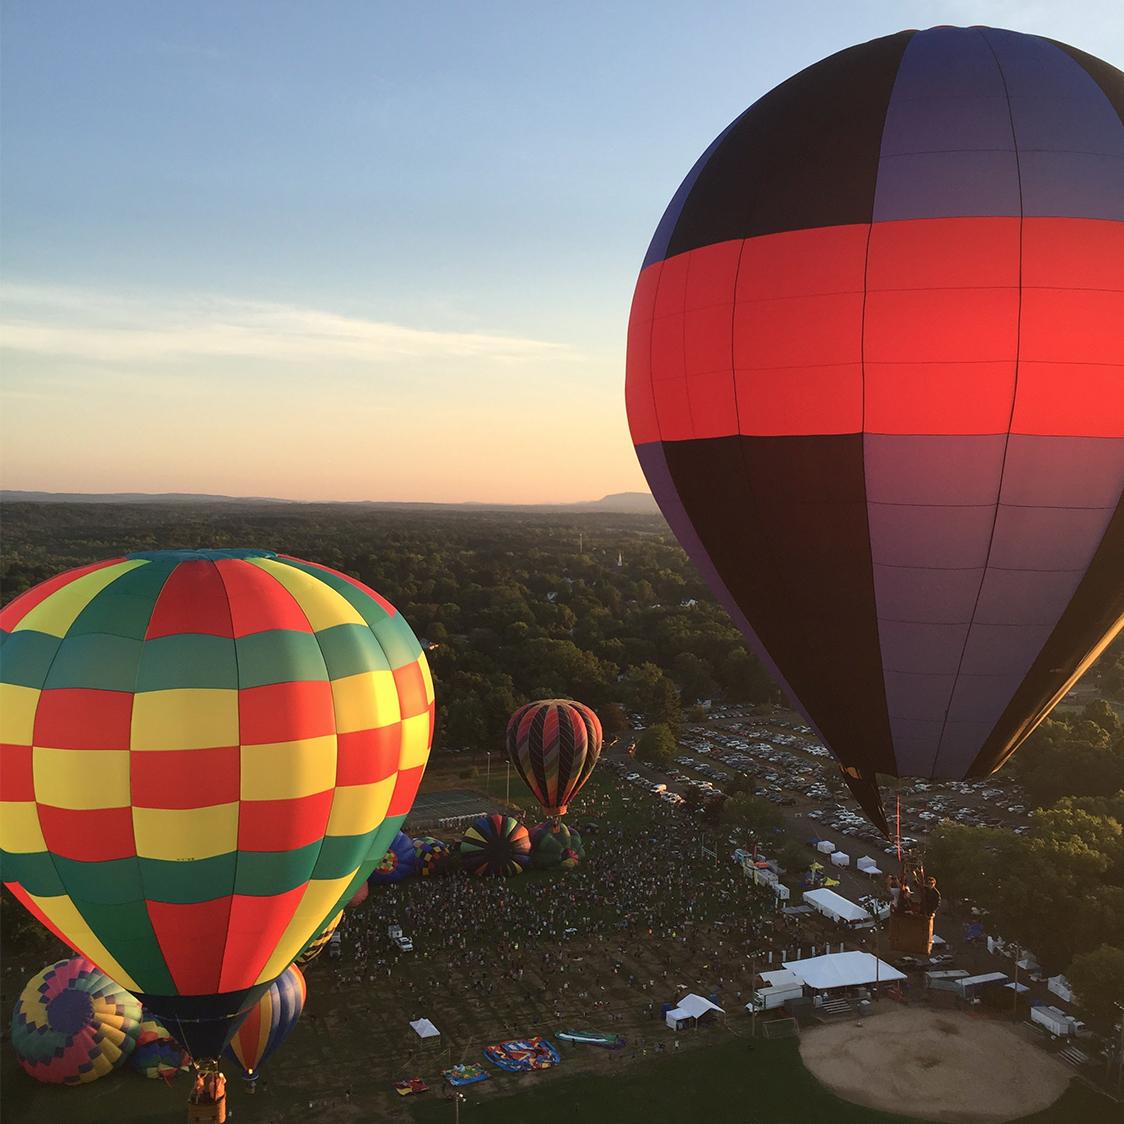 plainville_hot_air_balloon_festival.jpg